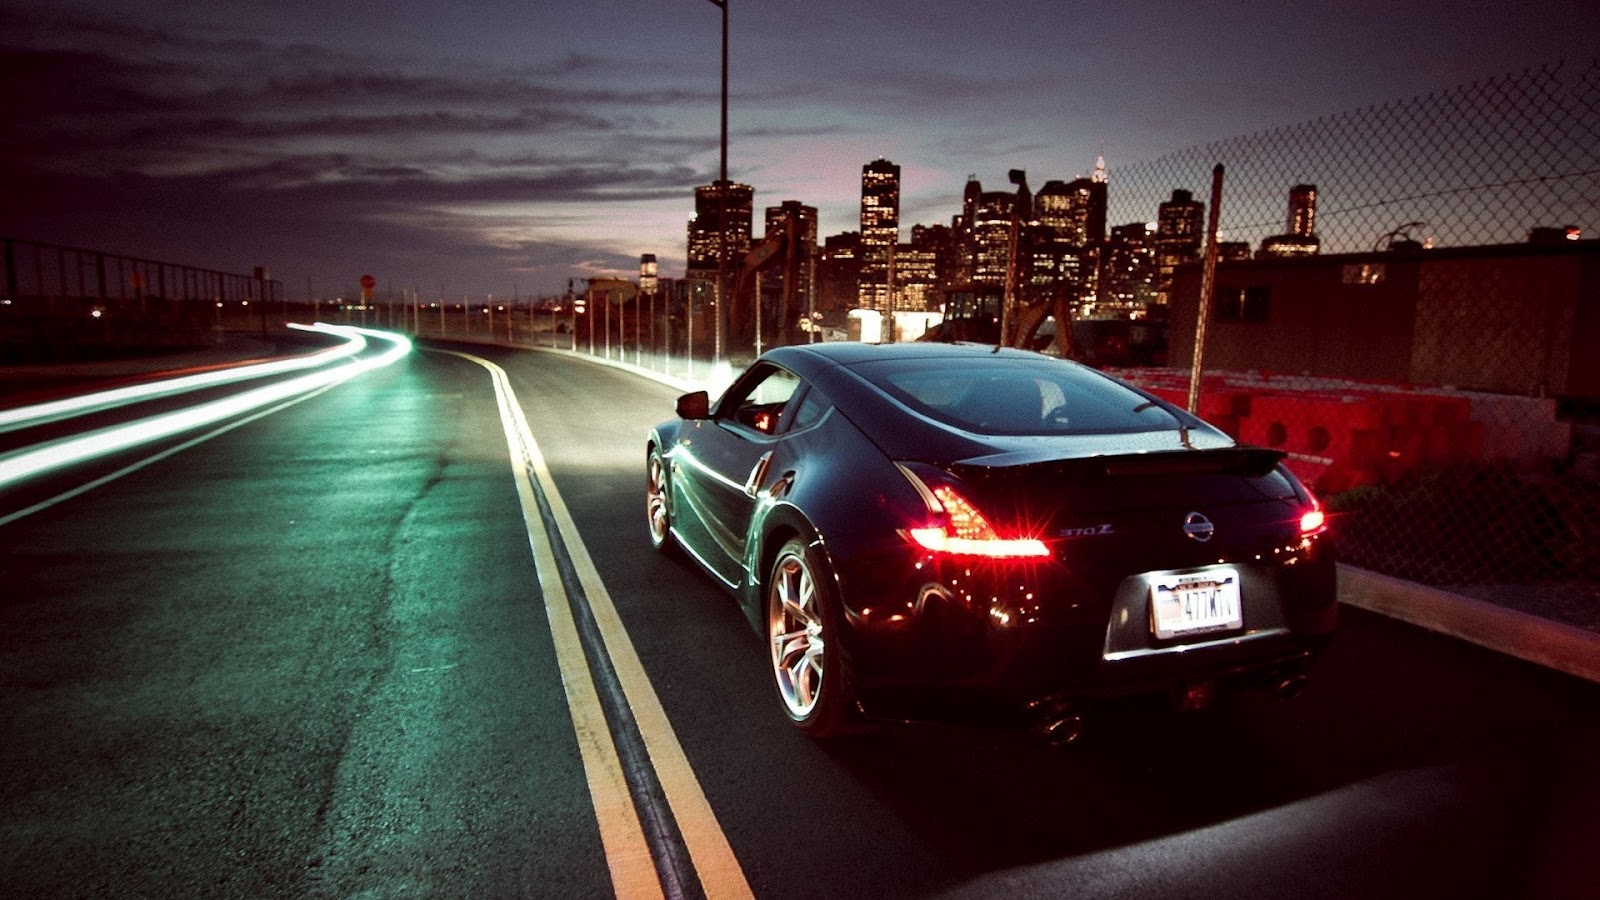 hd car wallpapers 1080p night-#1